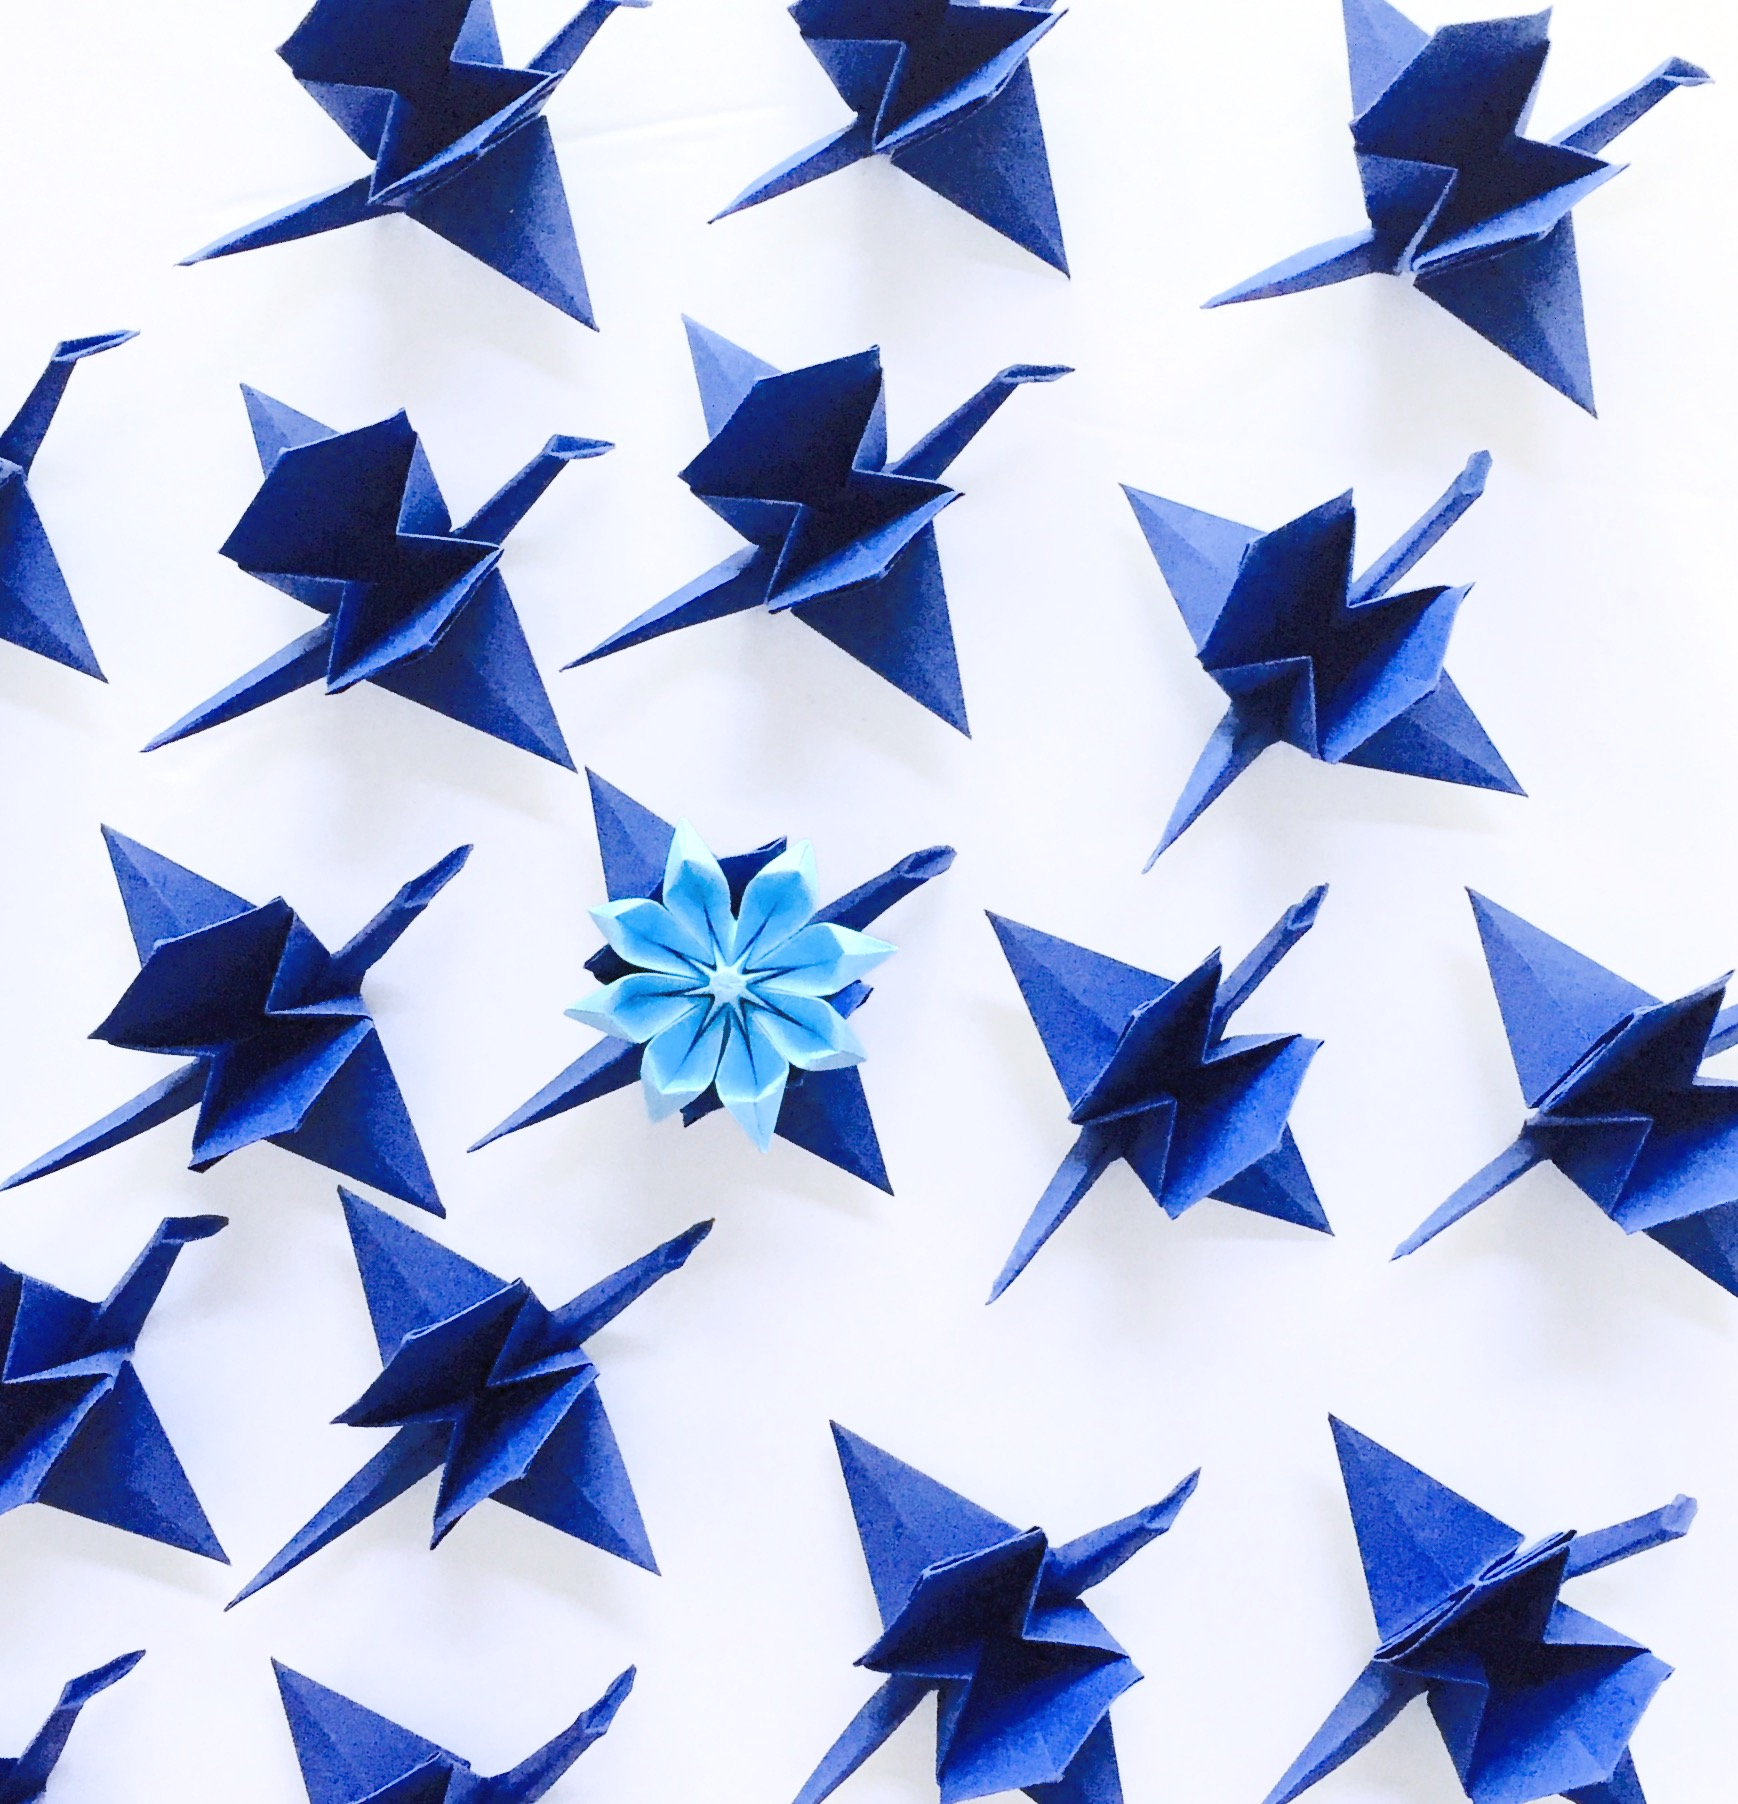 Origami Carriage Cranes + Origami Daisy